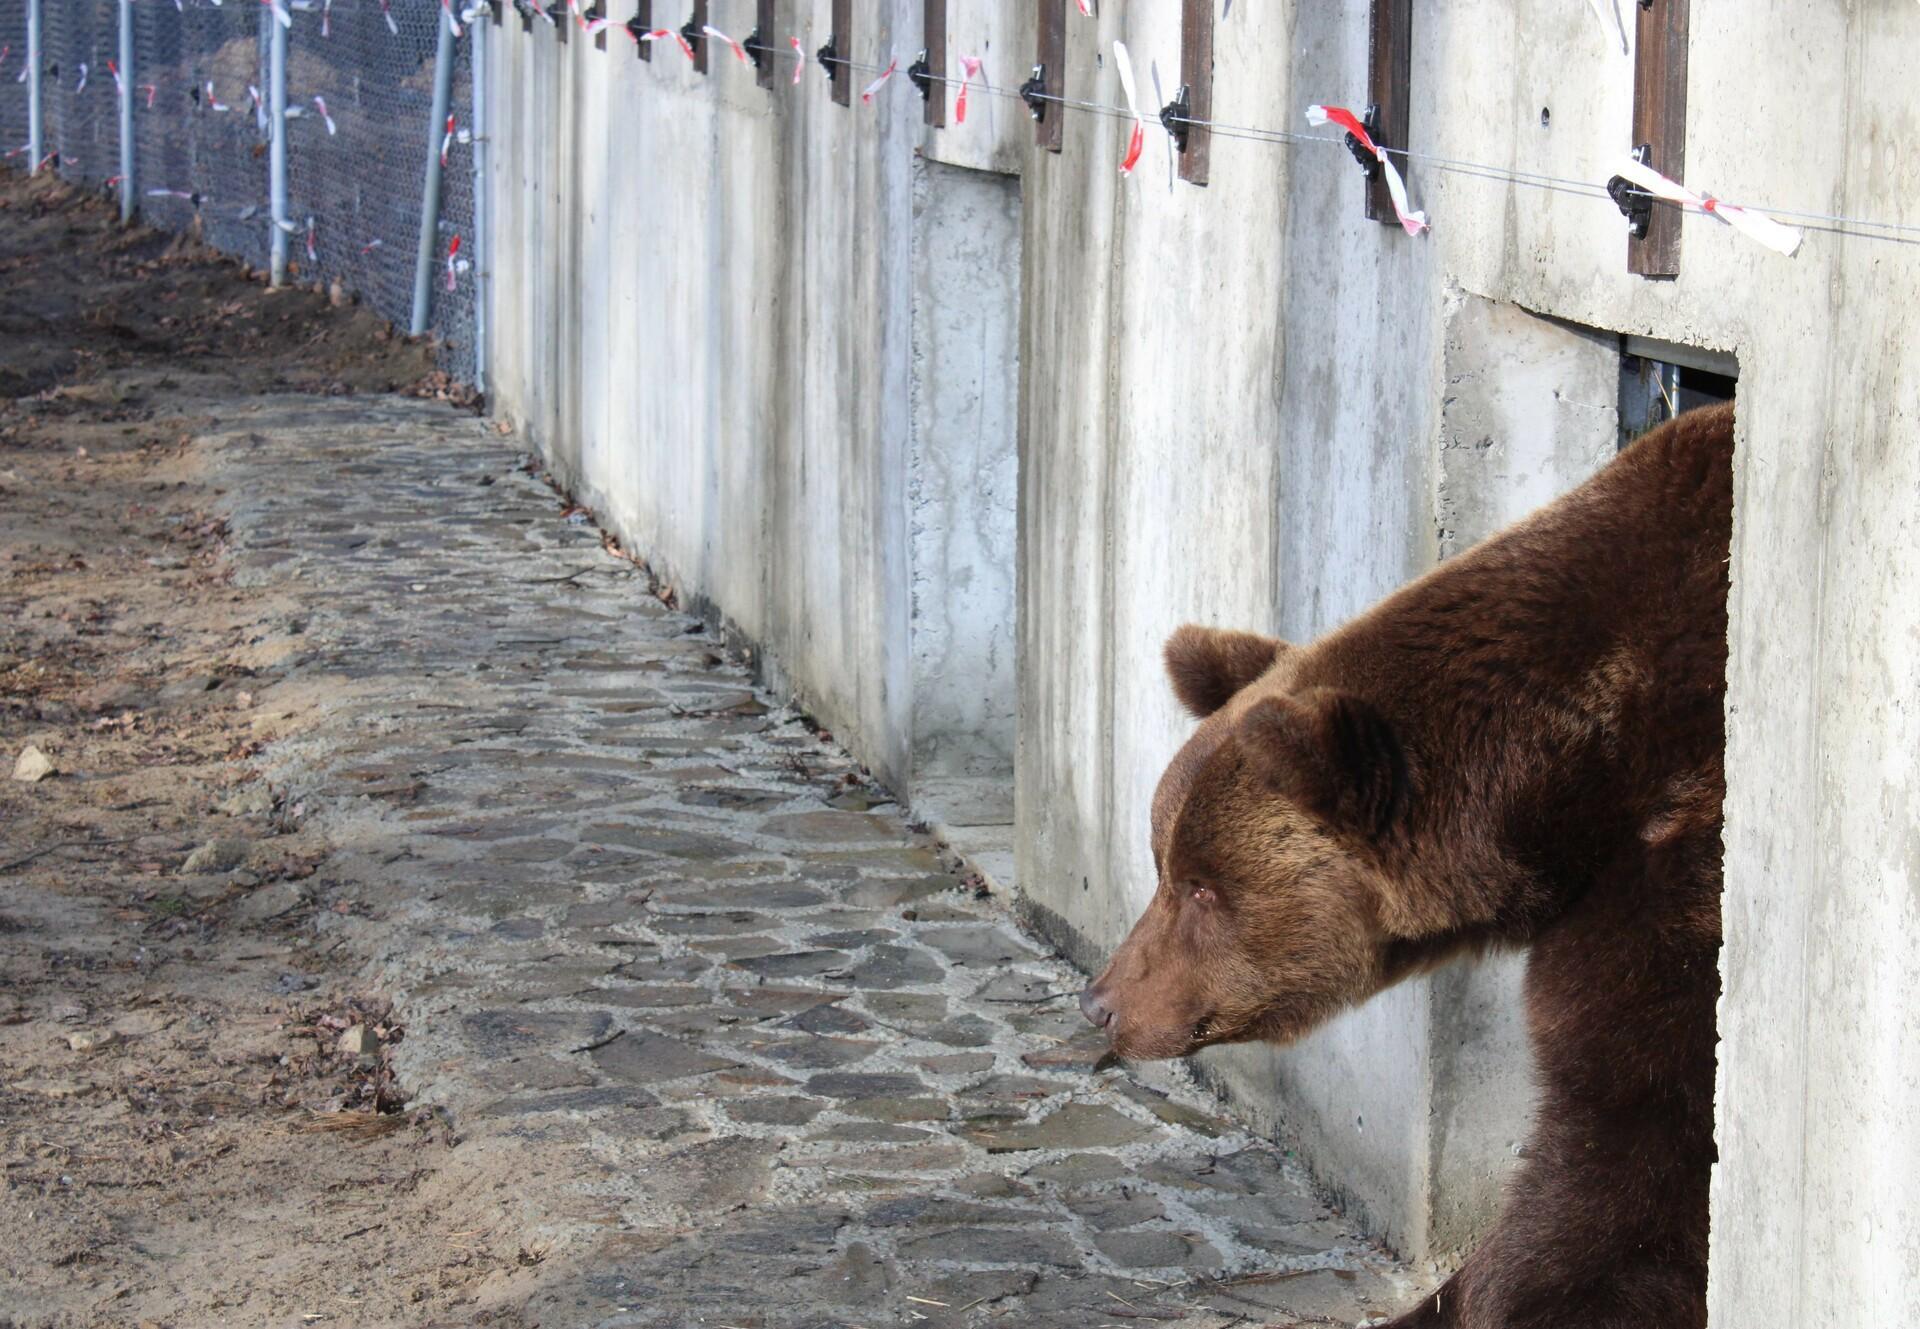 Bear Misha at BEAR SANCTUARY Domazhyr